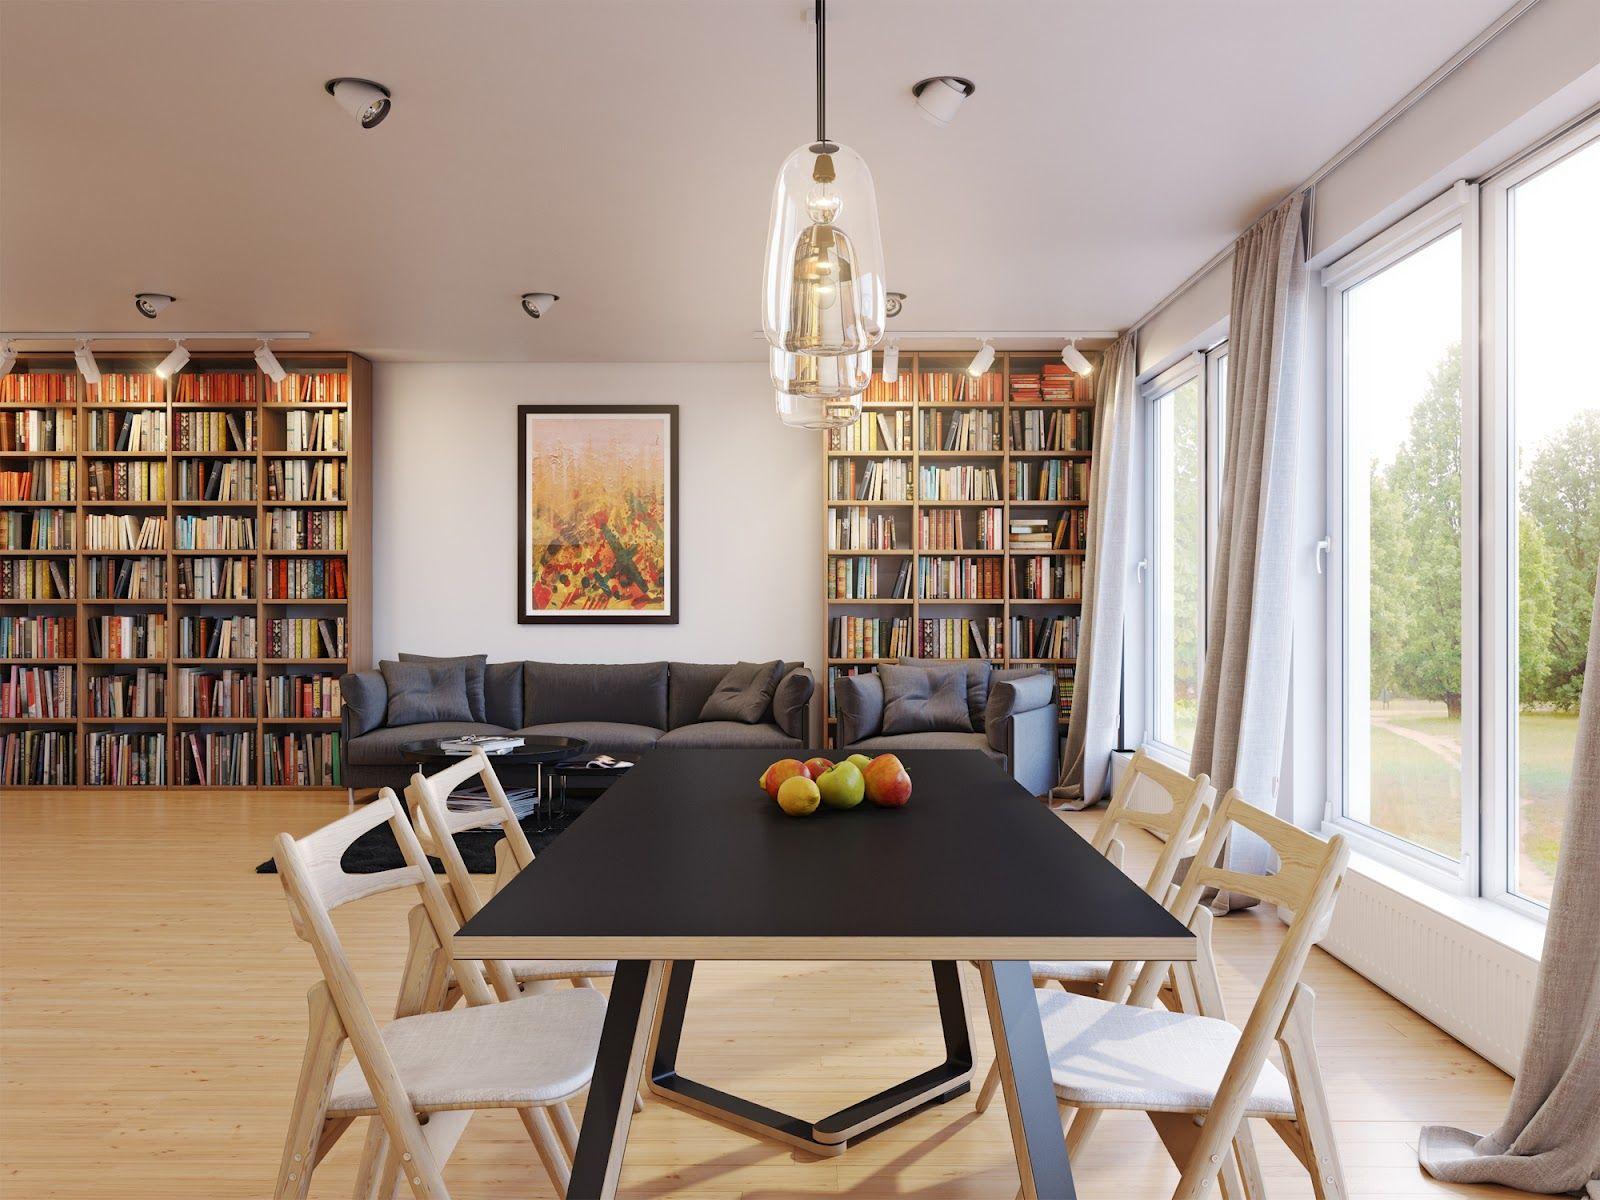 Wood Dining Room Furniture And Bookshelf Storage In Modern Kitchen Open Plan On Living Design Ideas